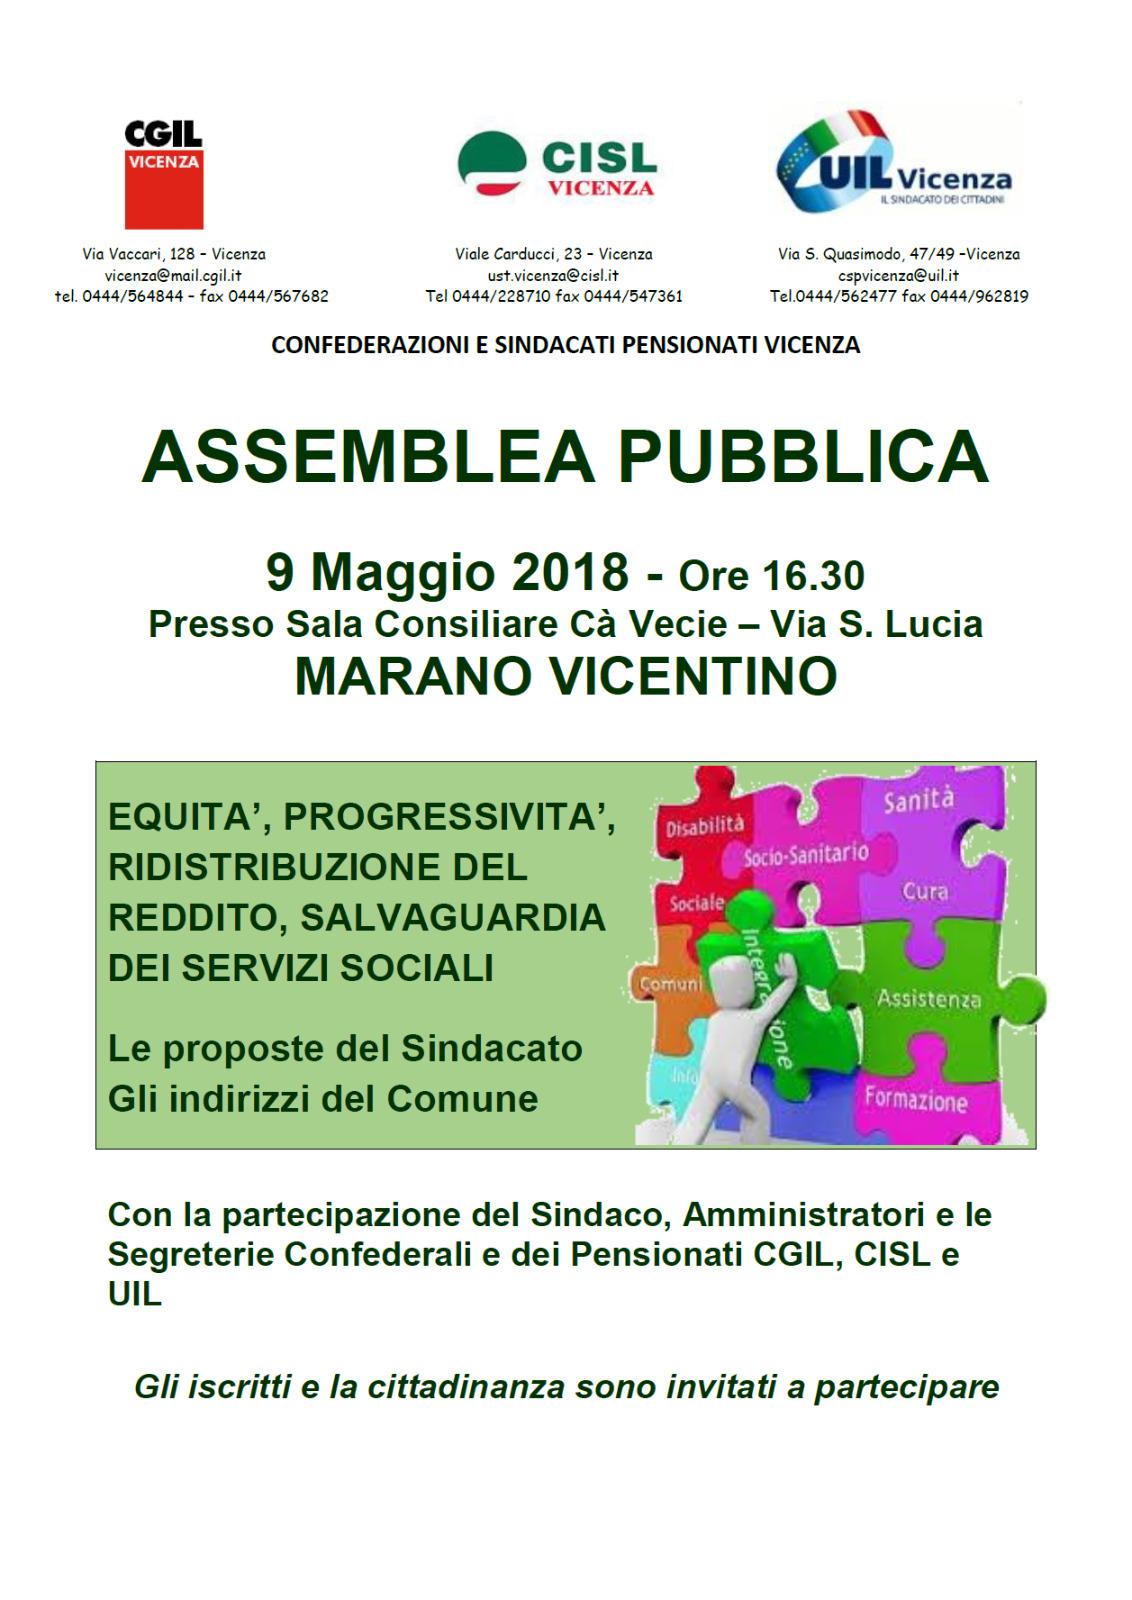 assemblea marano 9.05.2018